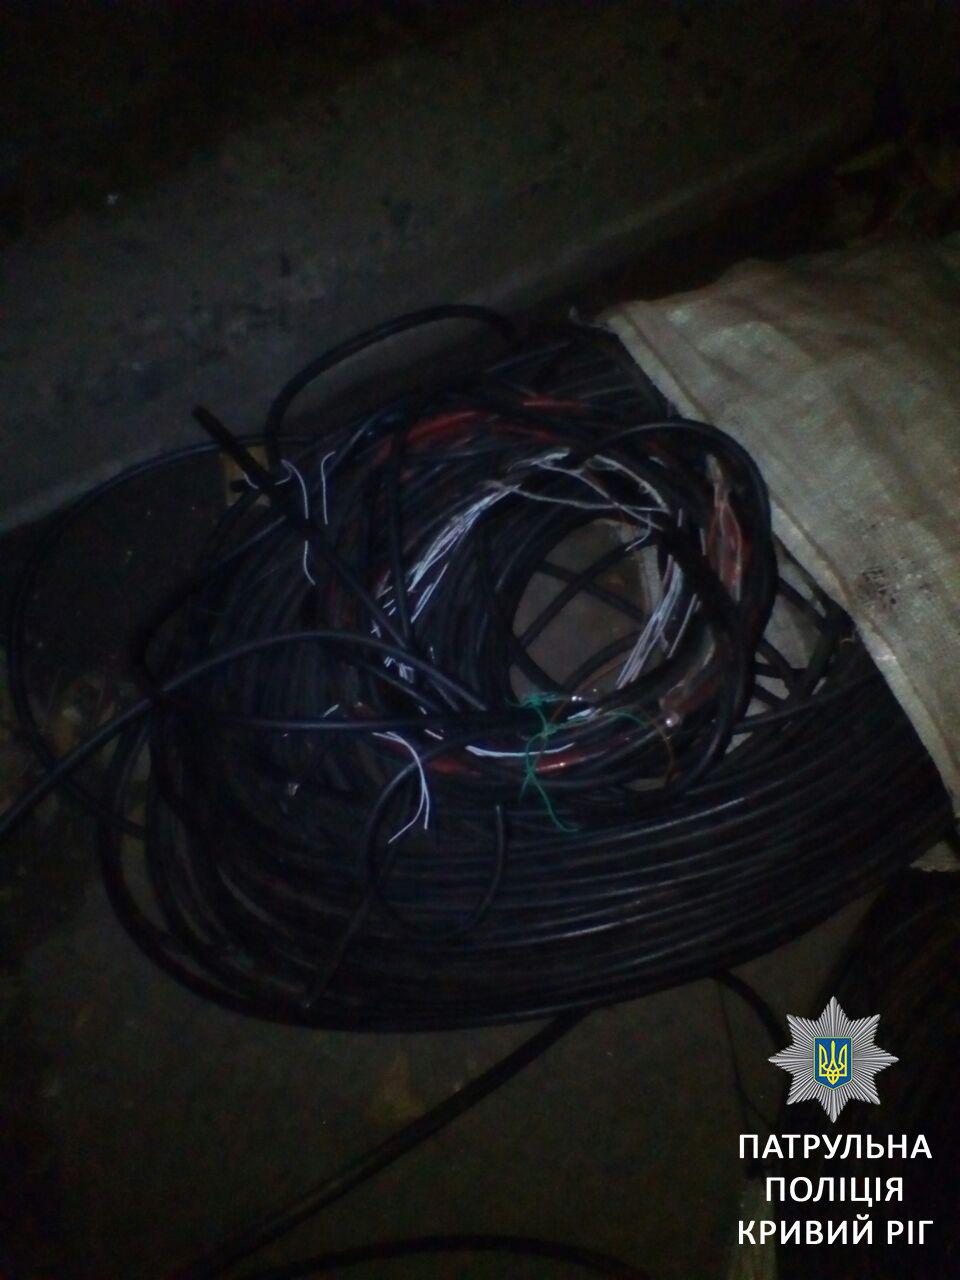 Полиция поймала криворожанина с двумя мешками краденного кабеля, - ФОТО, фото-3